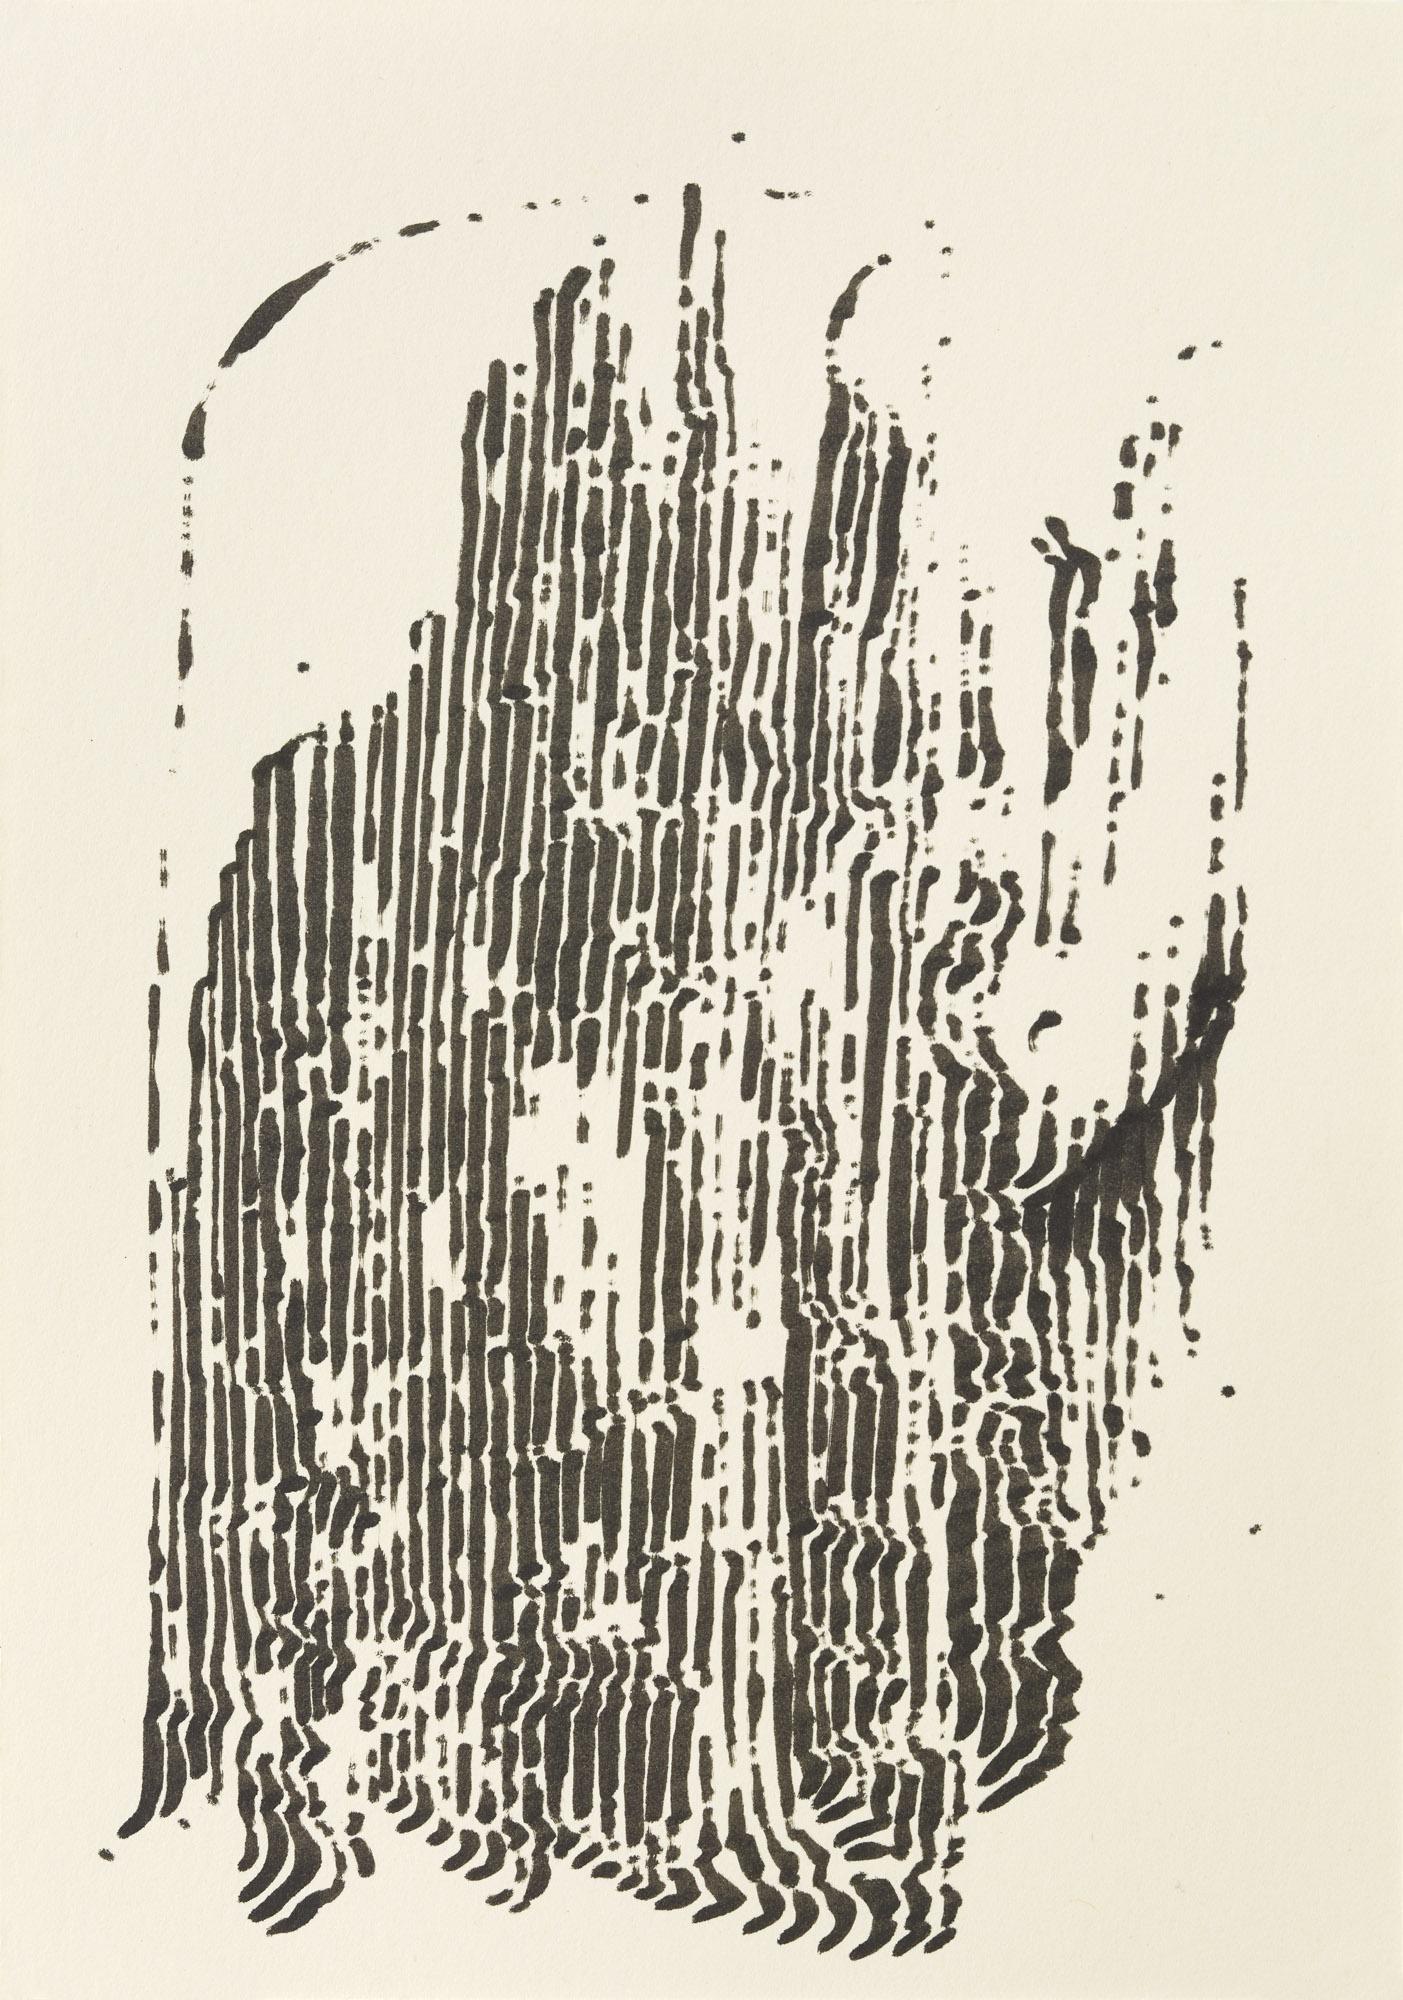 BK P7540 | untitled | ink on paper | 21x15cm | 2015